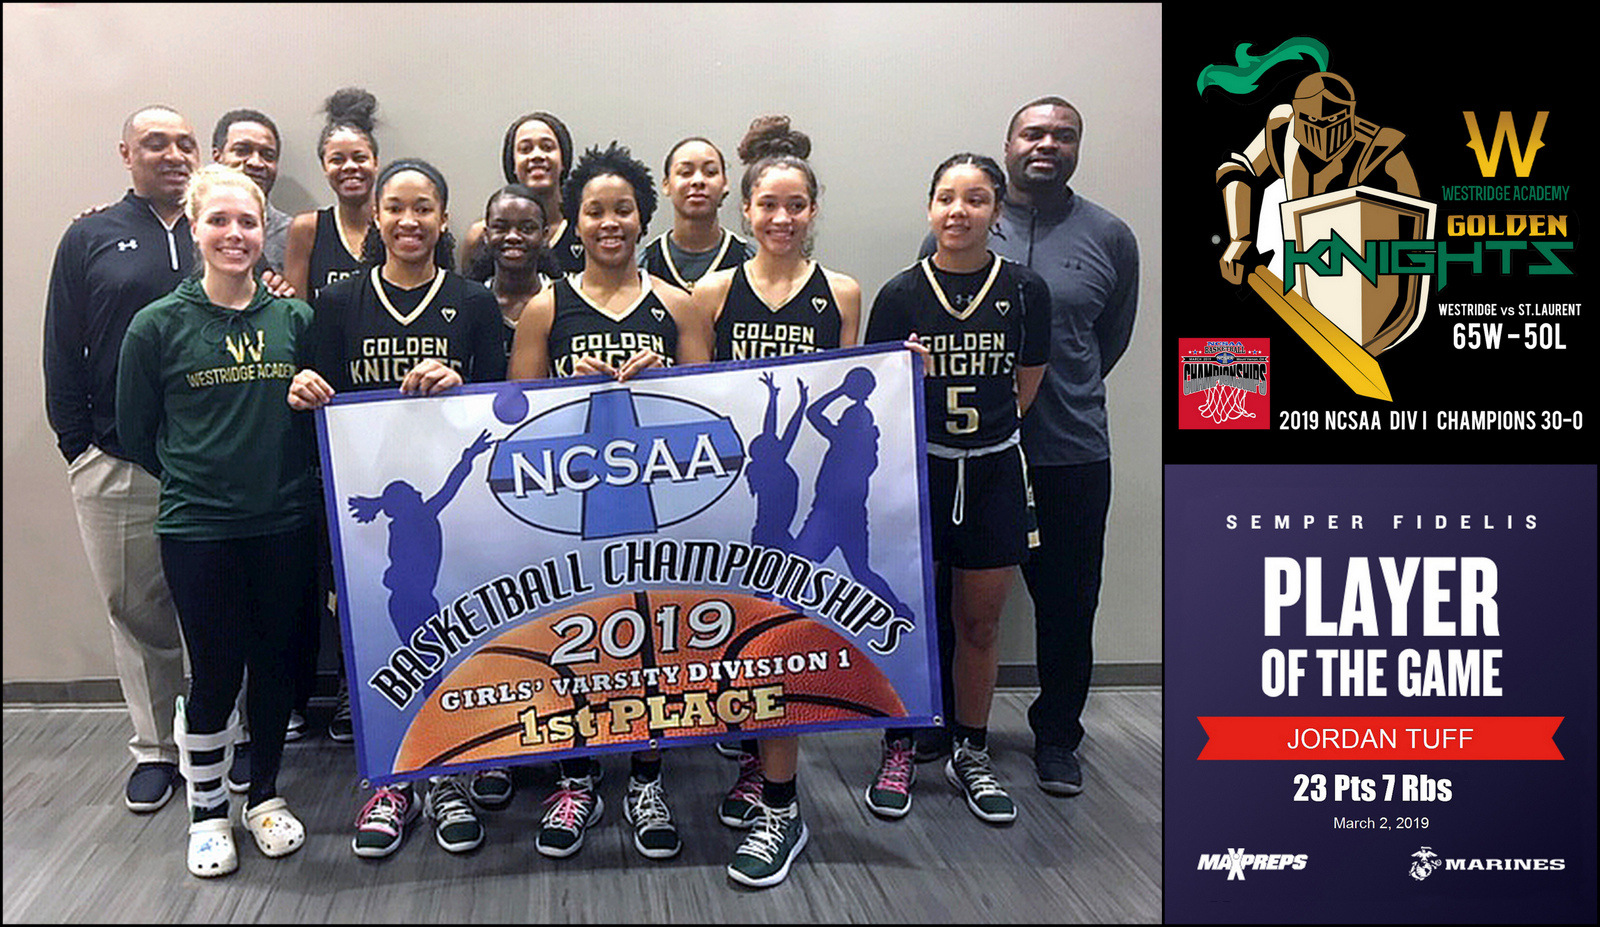 NCSAA Basketball Champions (30-0)